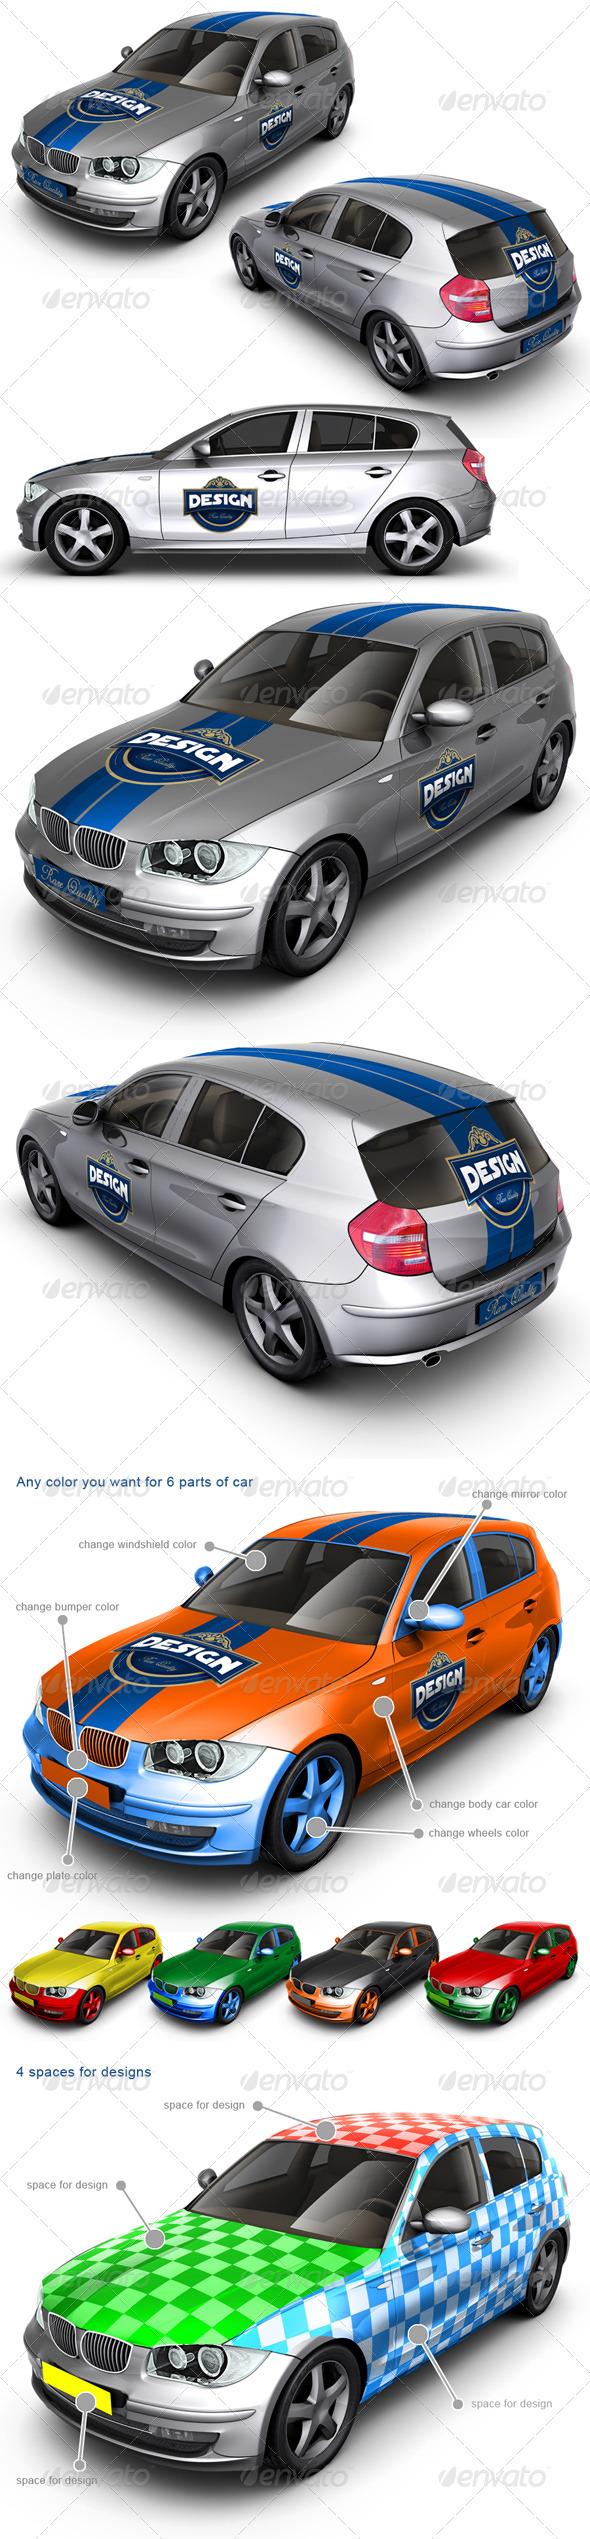 GraphicRiver Executive Family Car Mock Up 2207278